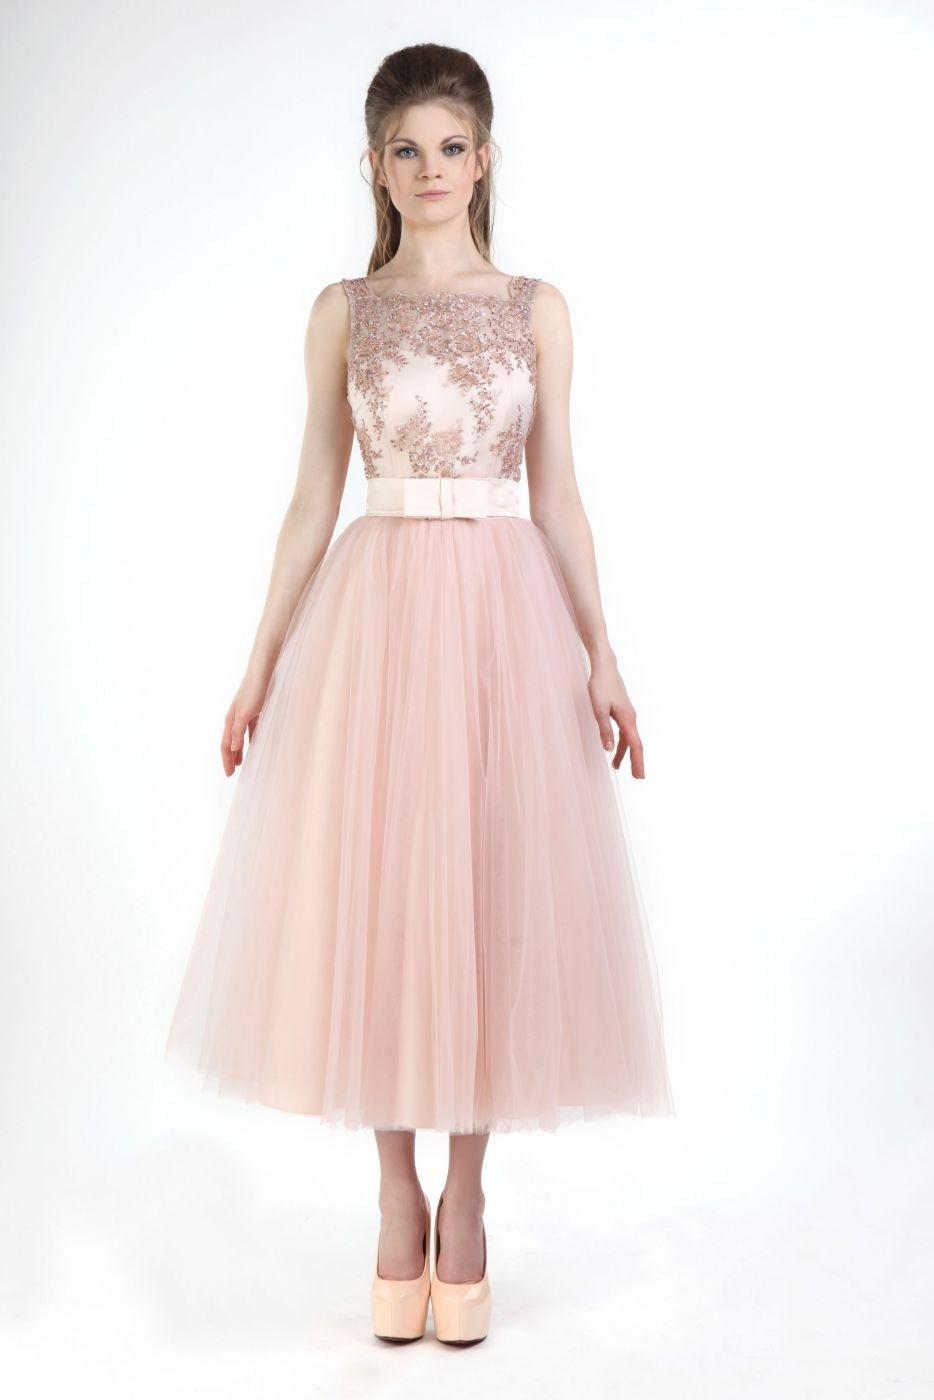 10 Spektakulär Kleid Beige Lang SpezialgebietFormal Genial Kleid Beige Lang Spezialgebiet